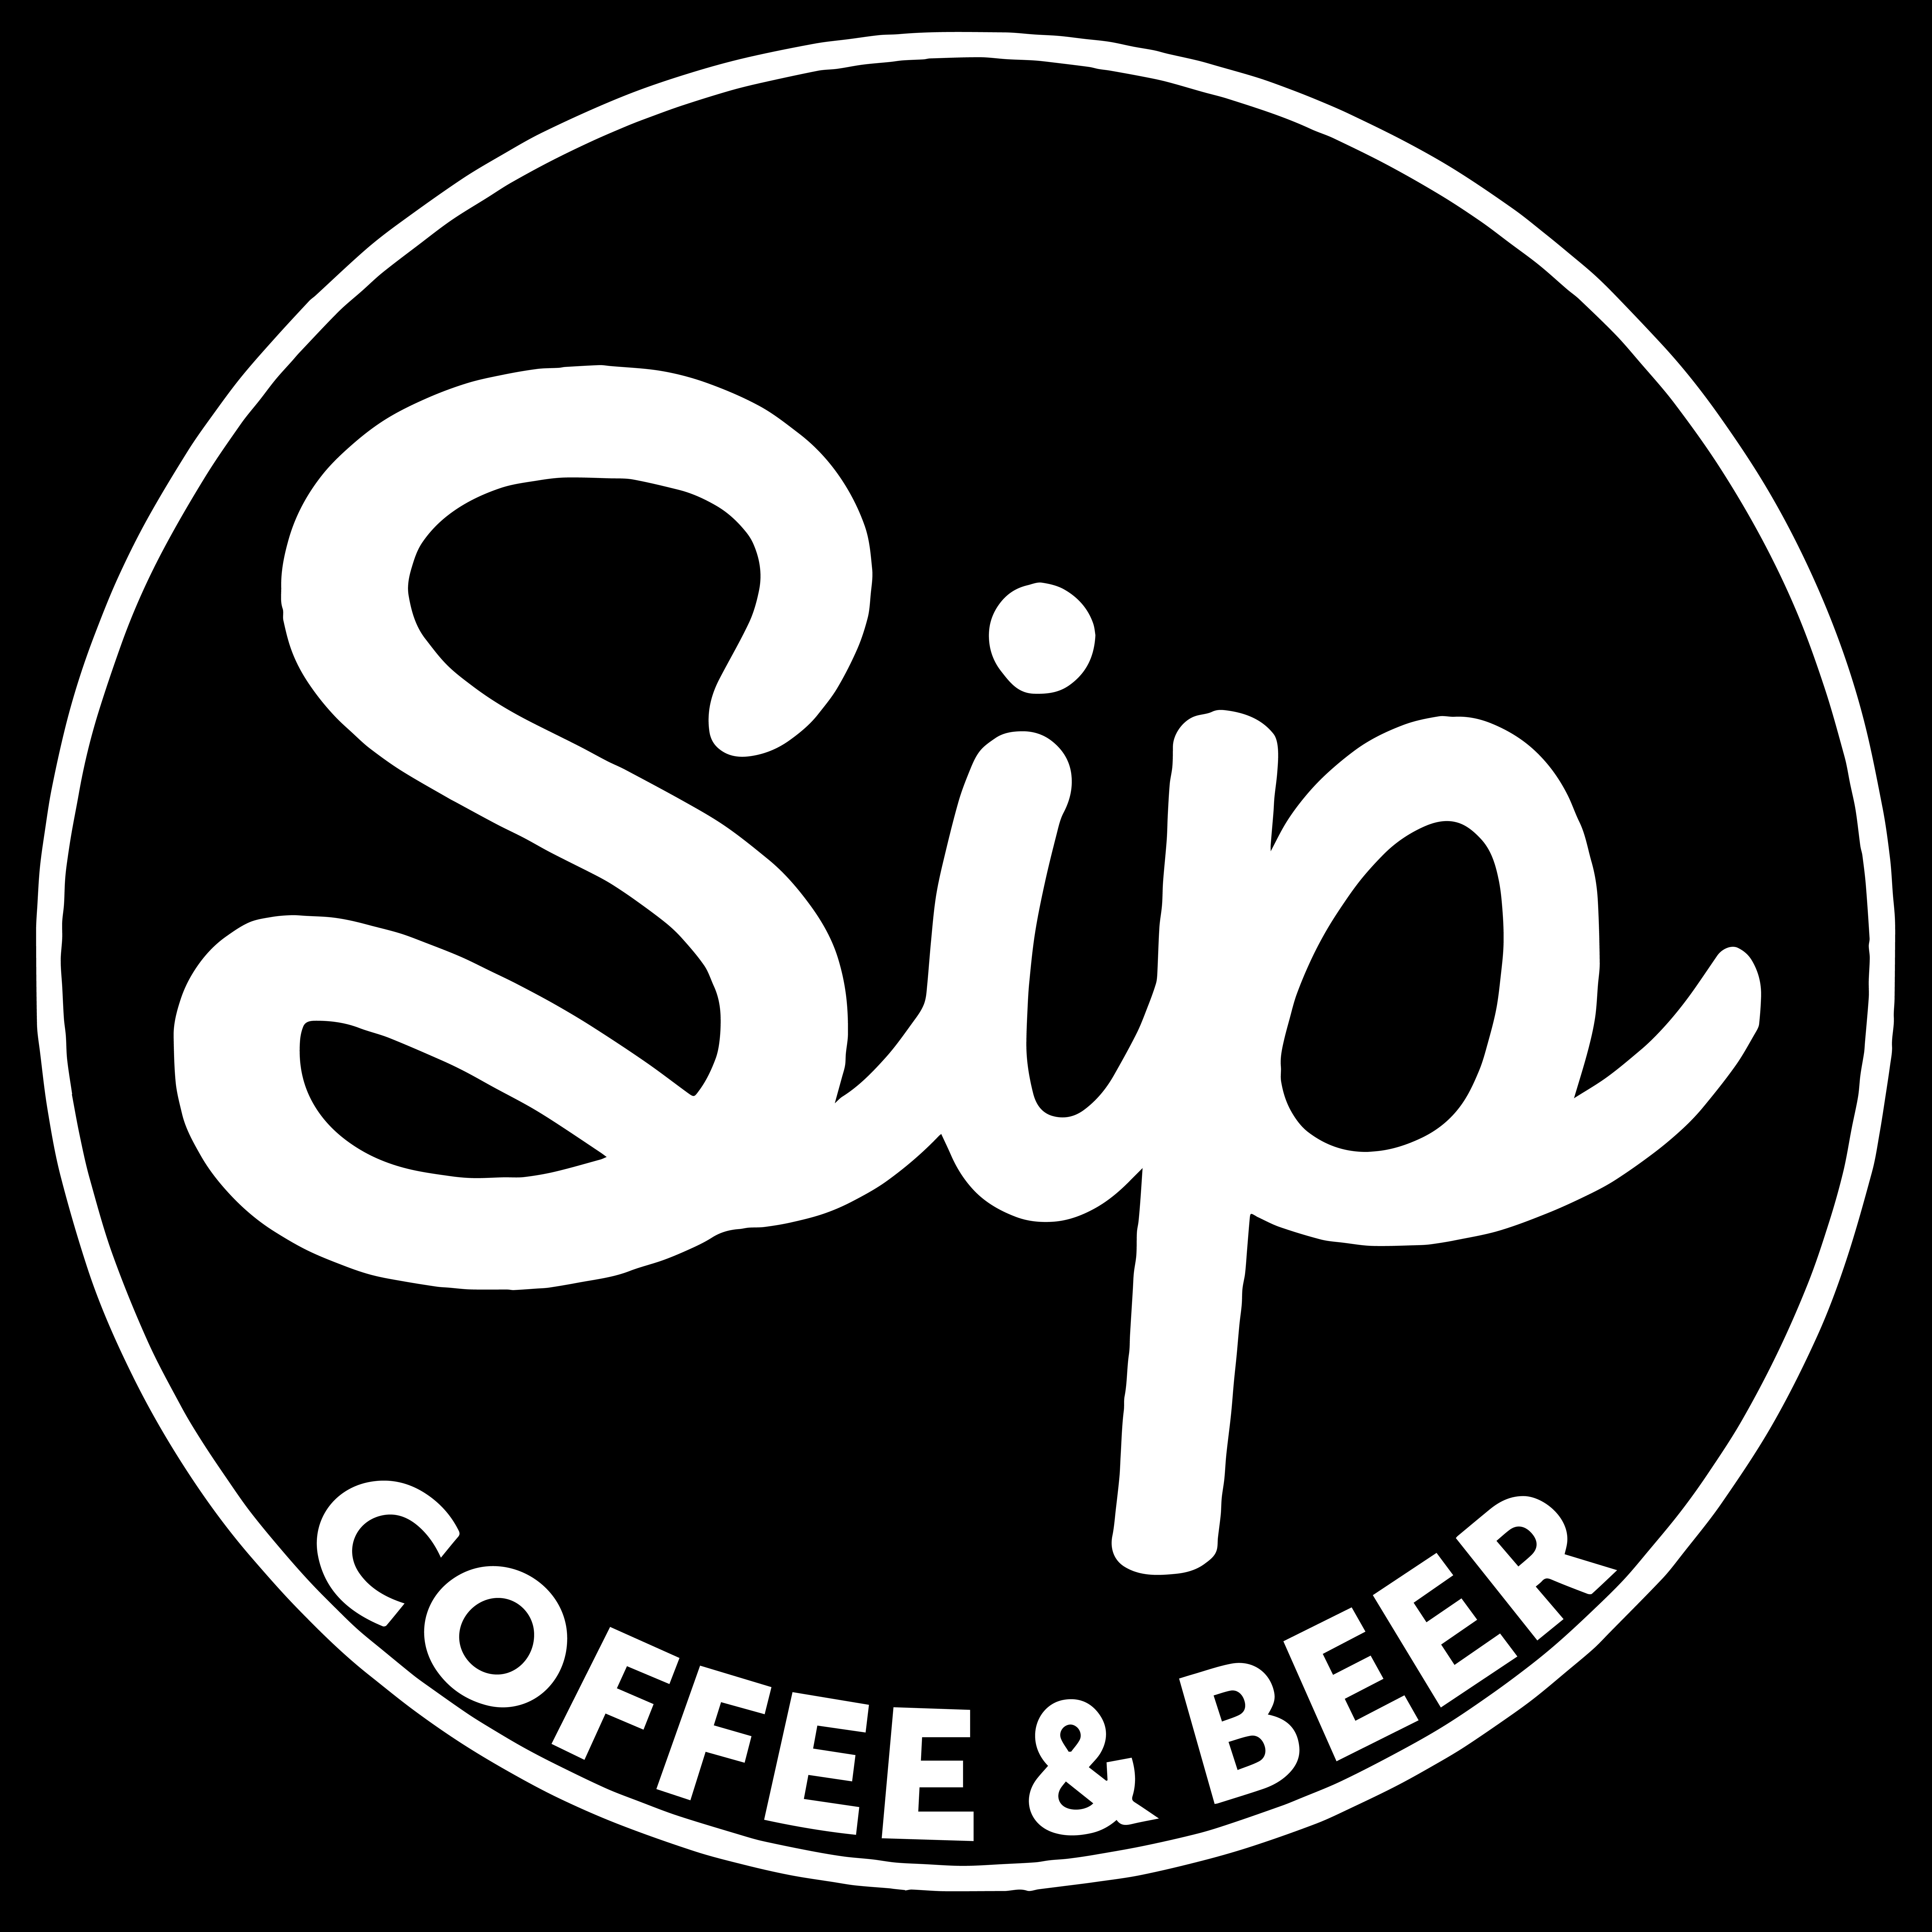 Sip Coffee & Beer Kitchen